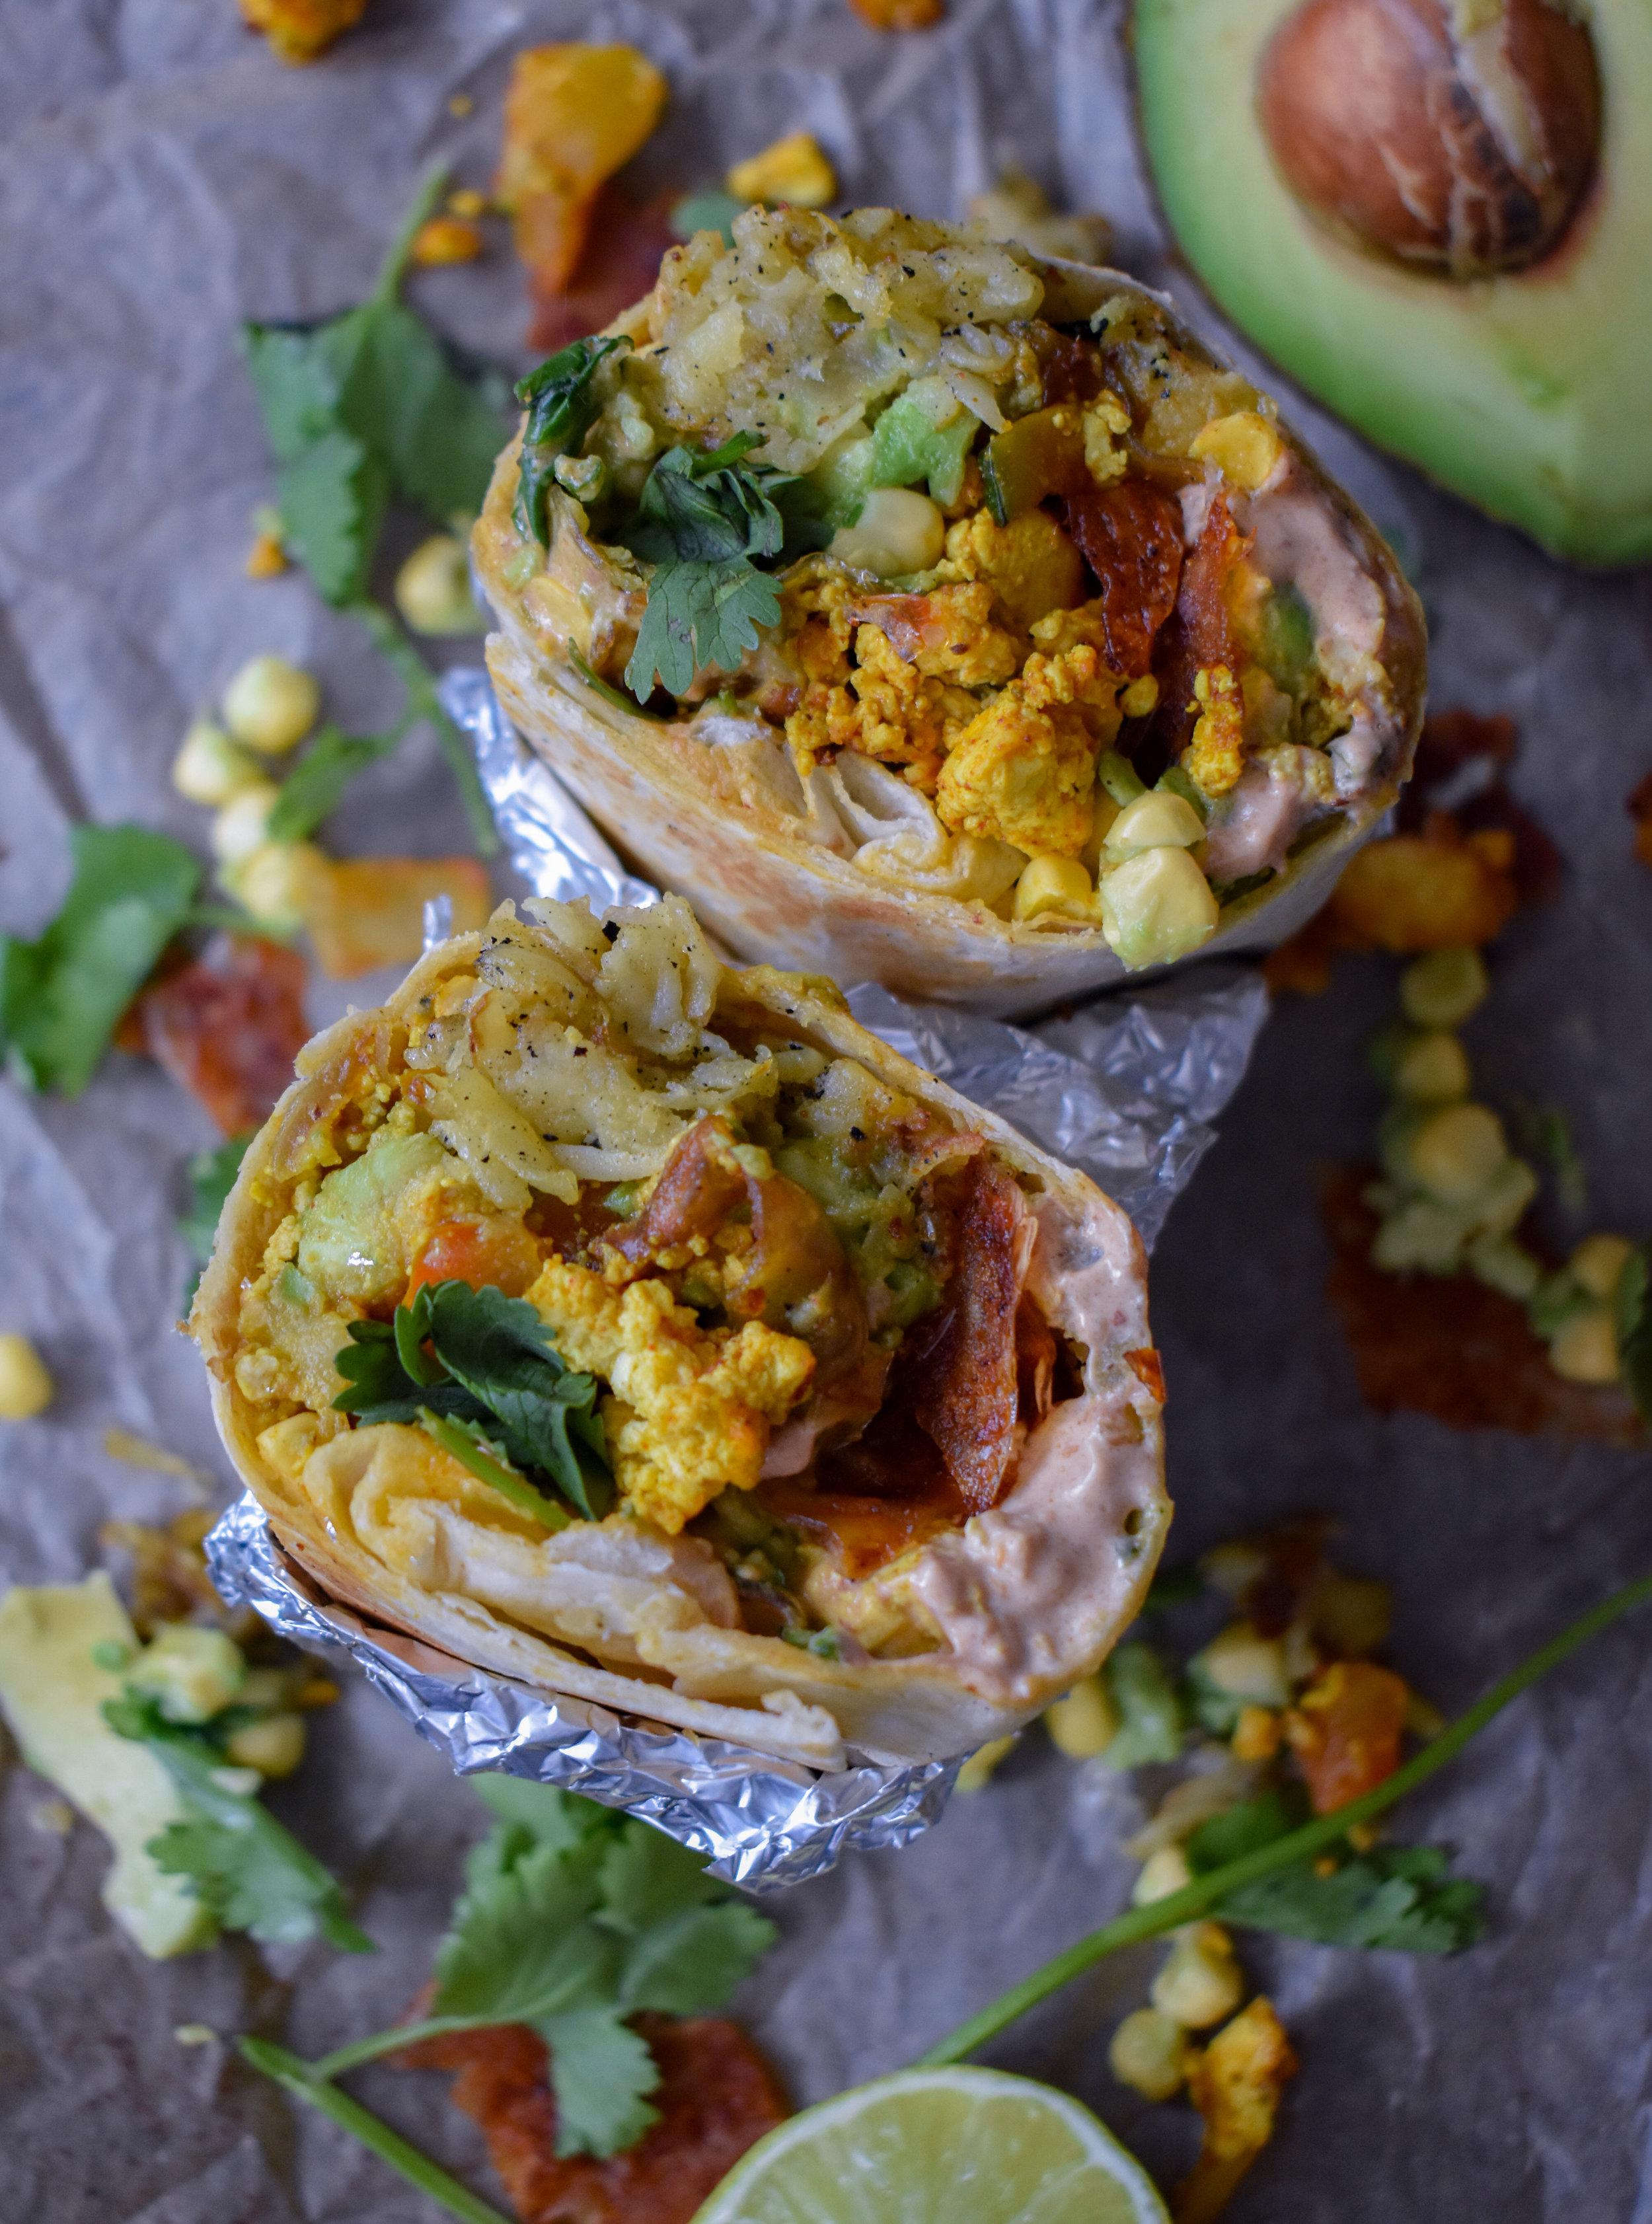 The Ultimate Vegan Breakfast Burrito W Crispy Hash Browns Vegan Bacon Turmeric Tofu Scramble Lime Corn Guac And Chipotle Sour Cream The Vegan Caveman